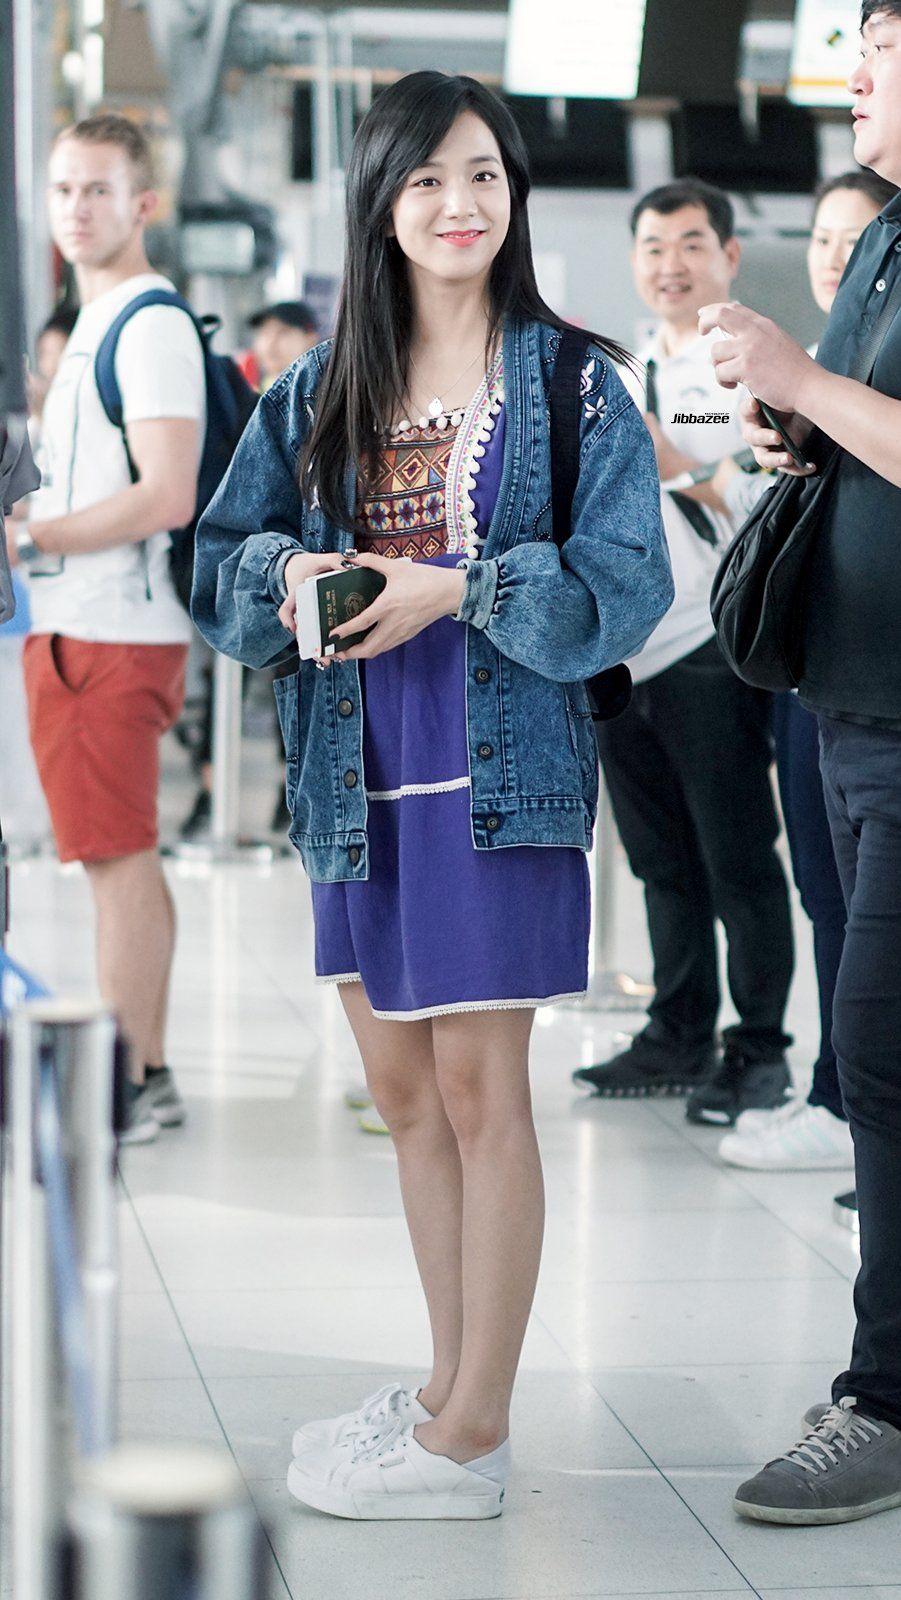 DPtfDHIVoAEmCHI.jpglarge (901u00d71600) | Jisoo Blackpink Airport Style | Pinterest | Blackpink Yg ...